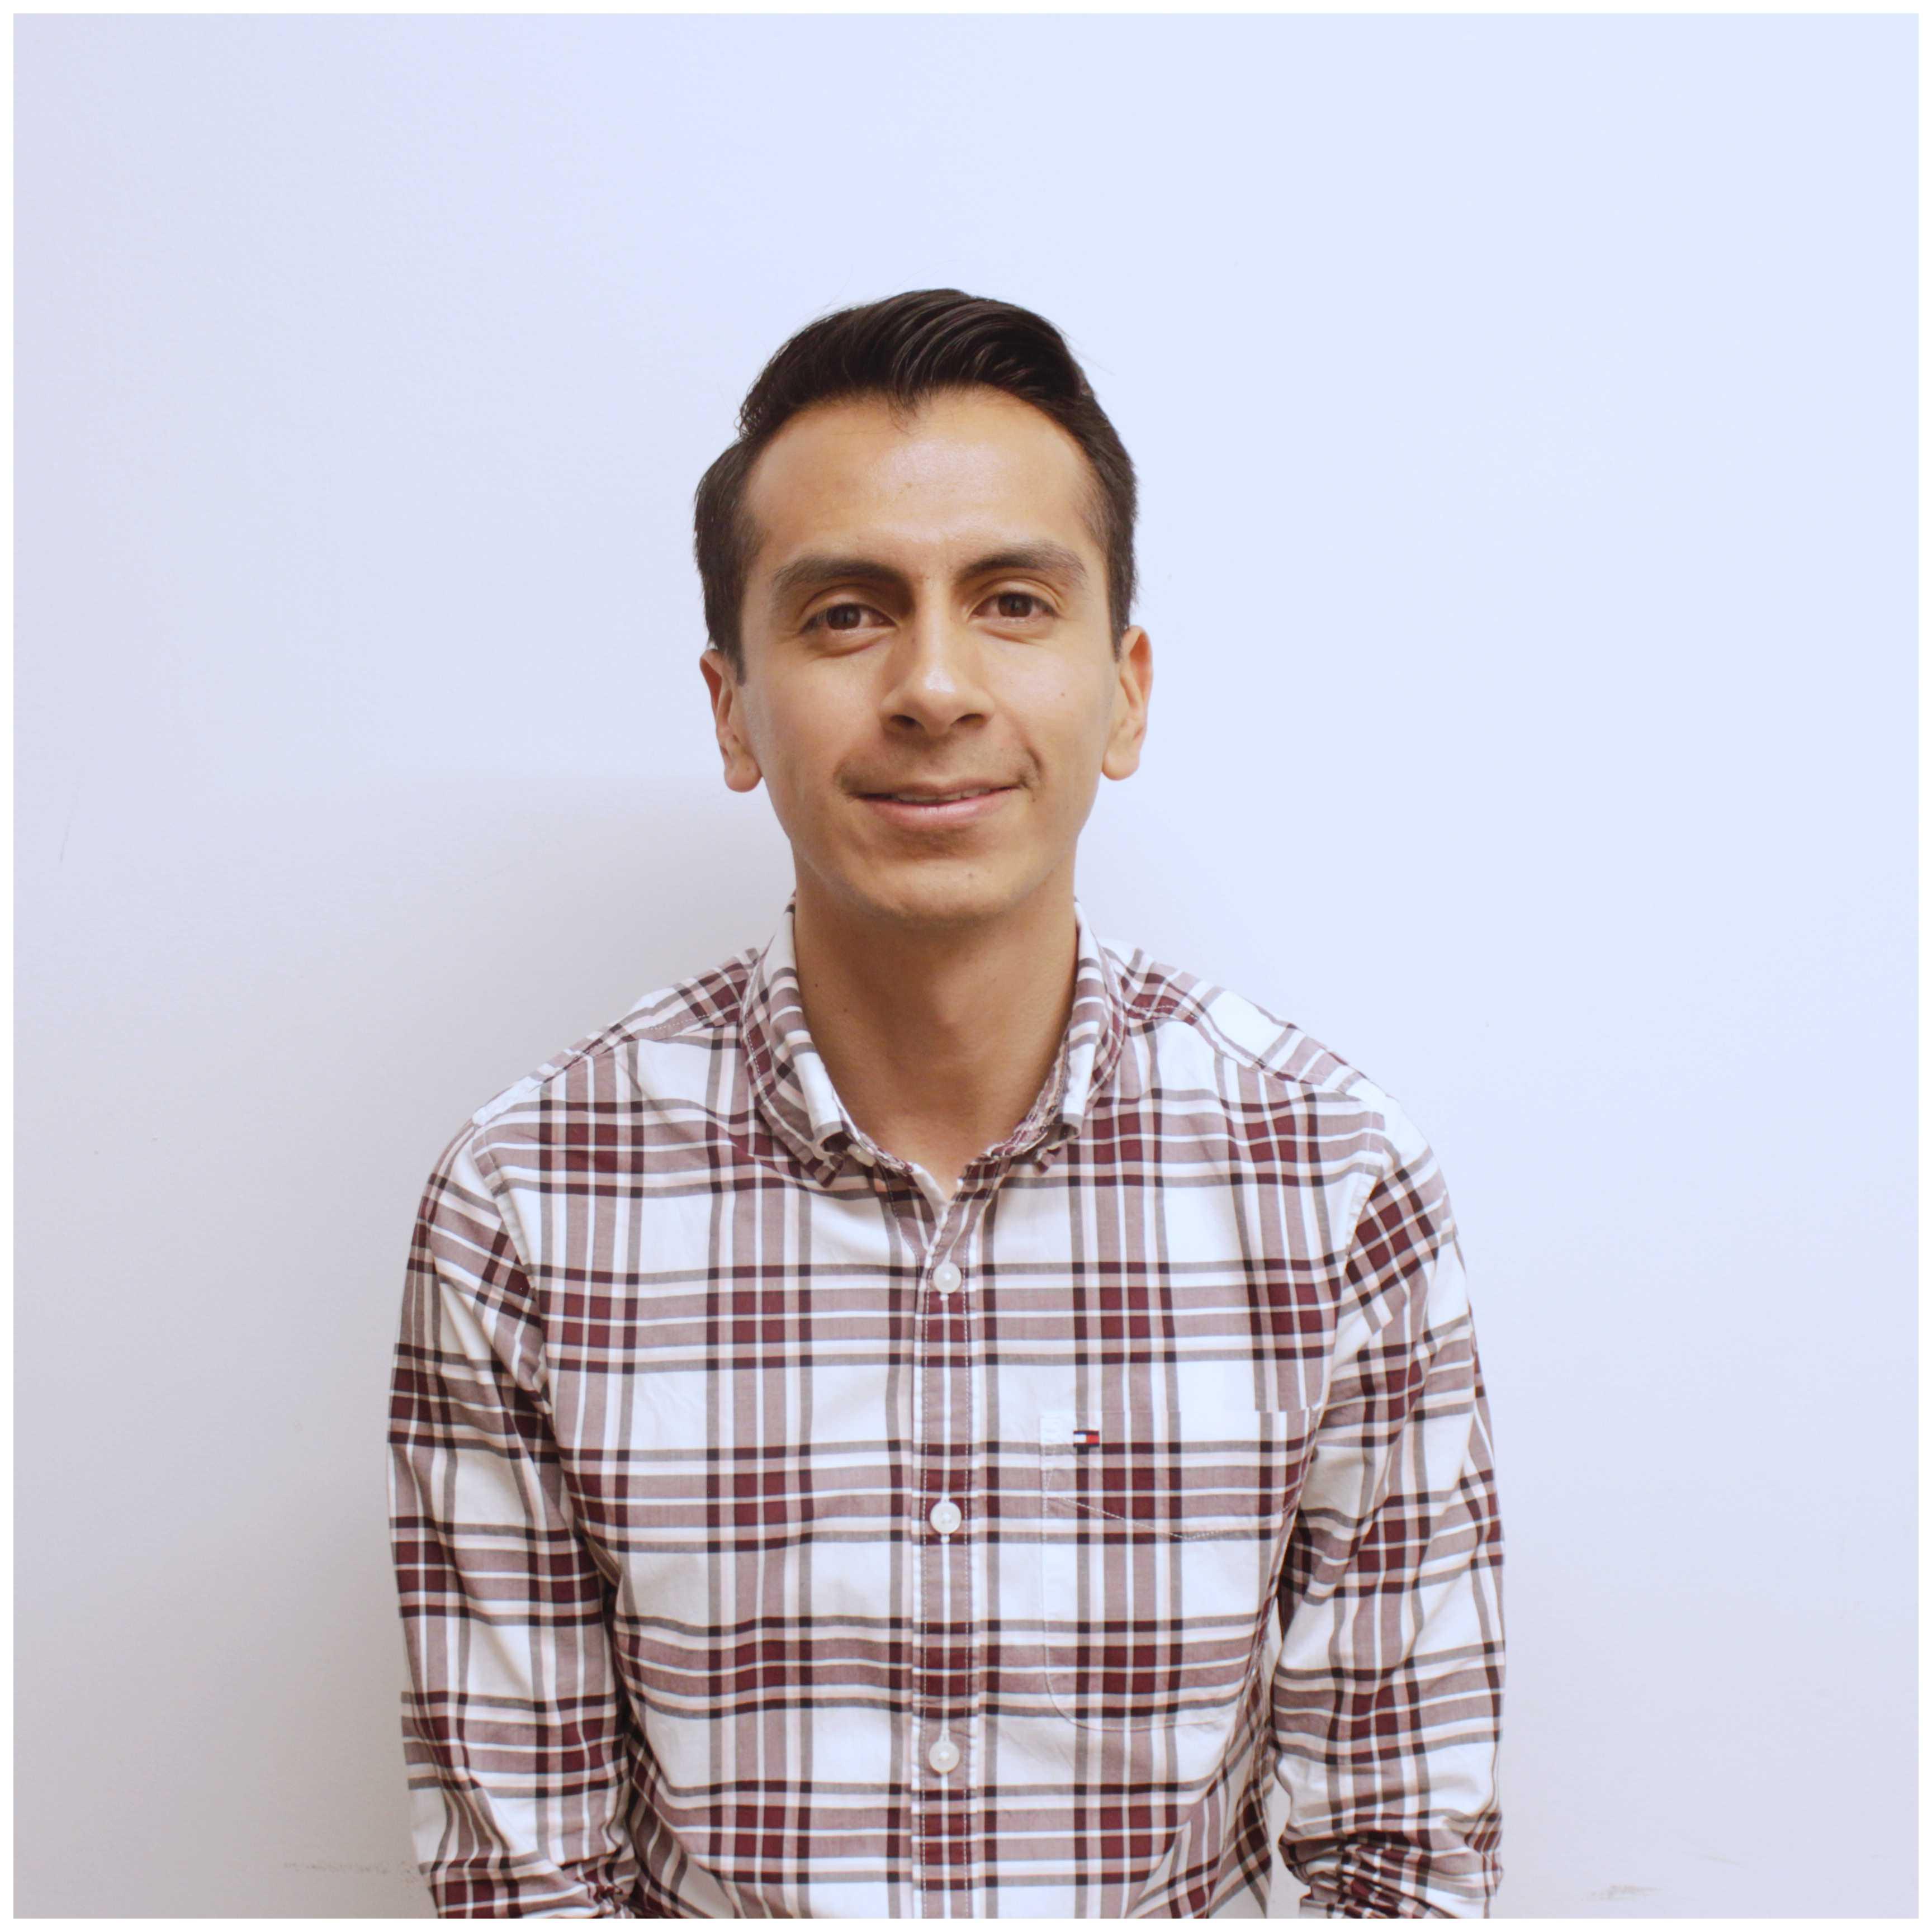 Diego Fernando Rodríguez